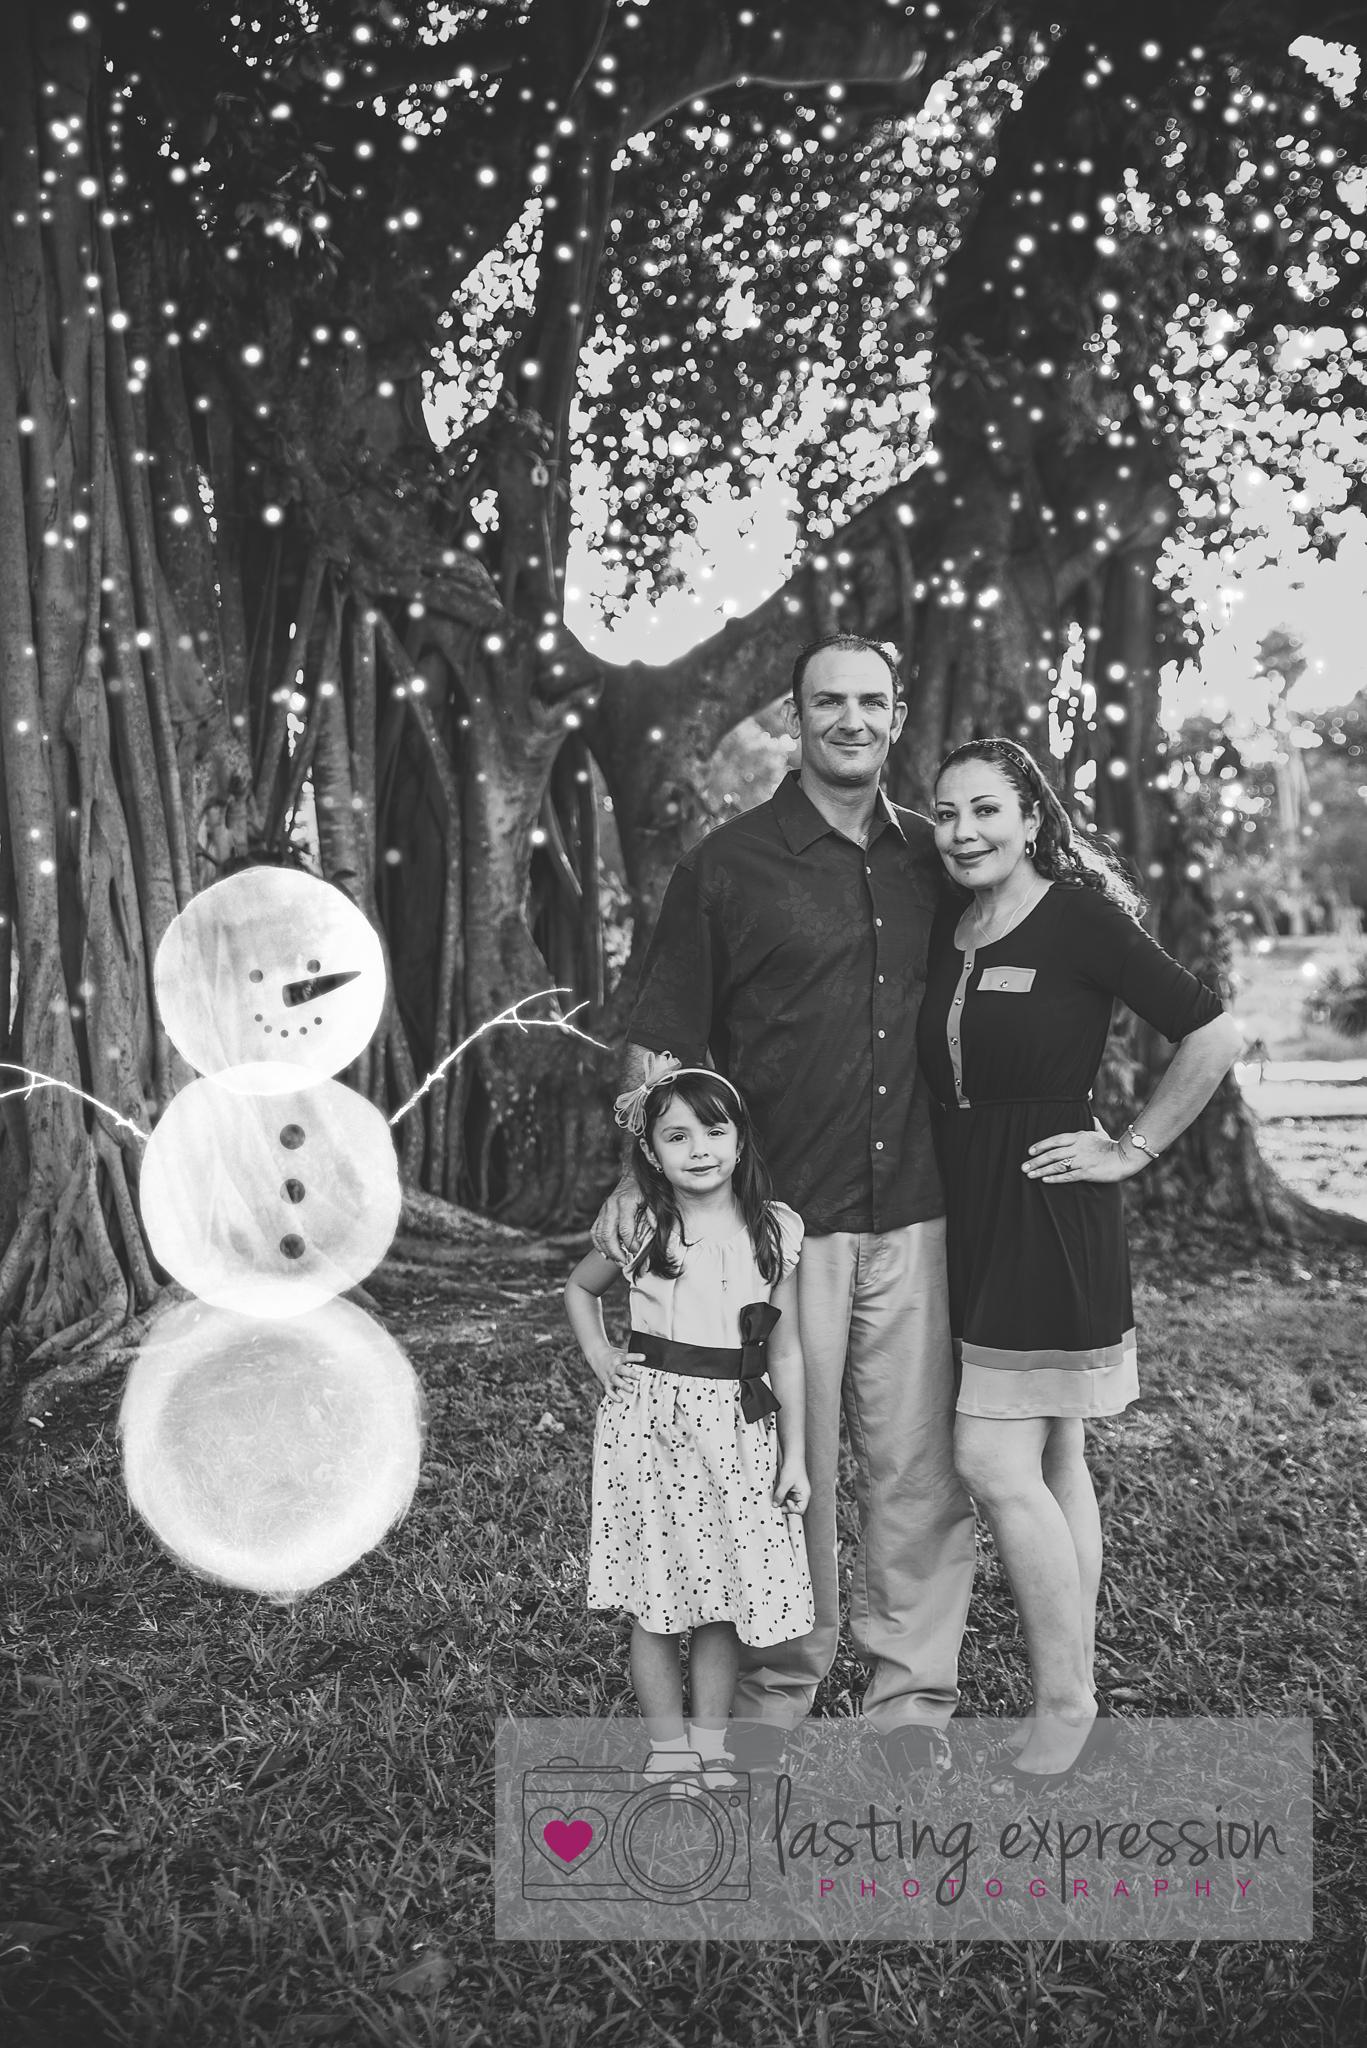 dunitzfamily-snowmanmini-logo-3.jpg